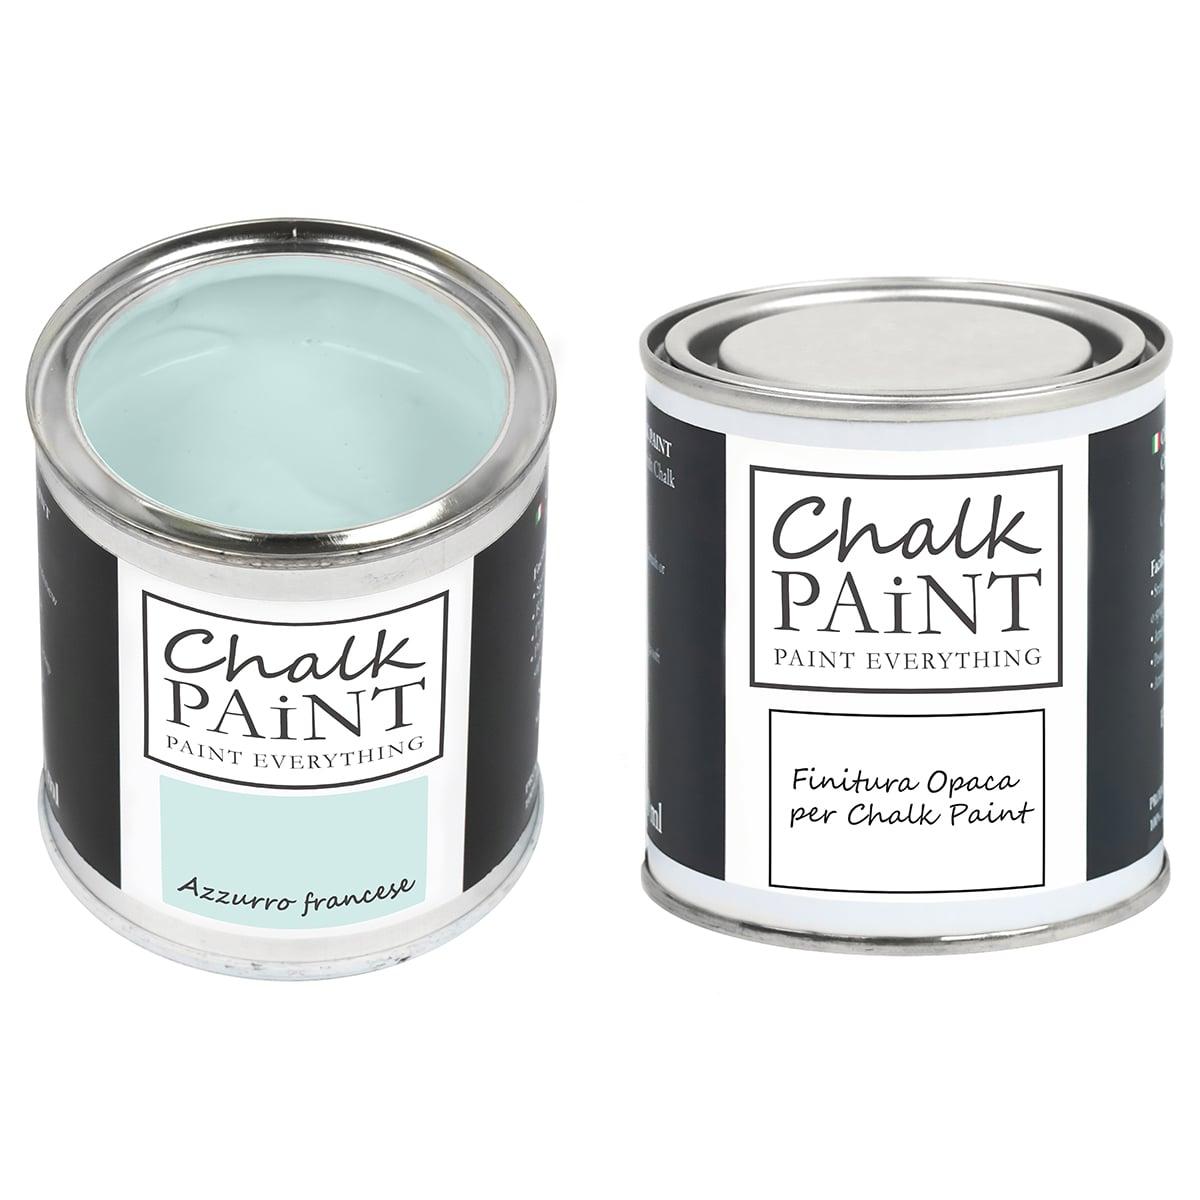 Chalk Paint Azzurro Francese + Finitura